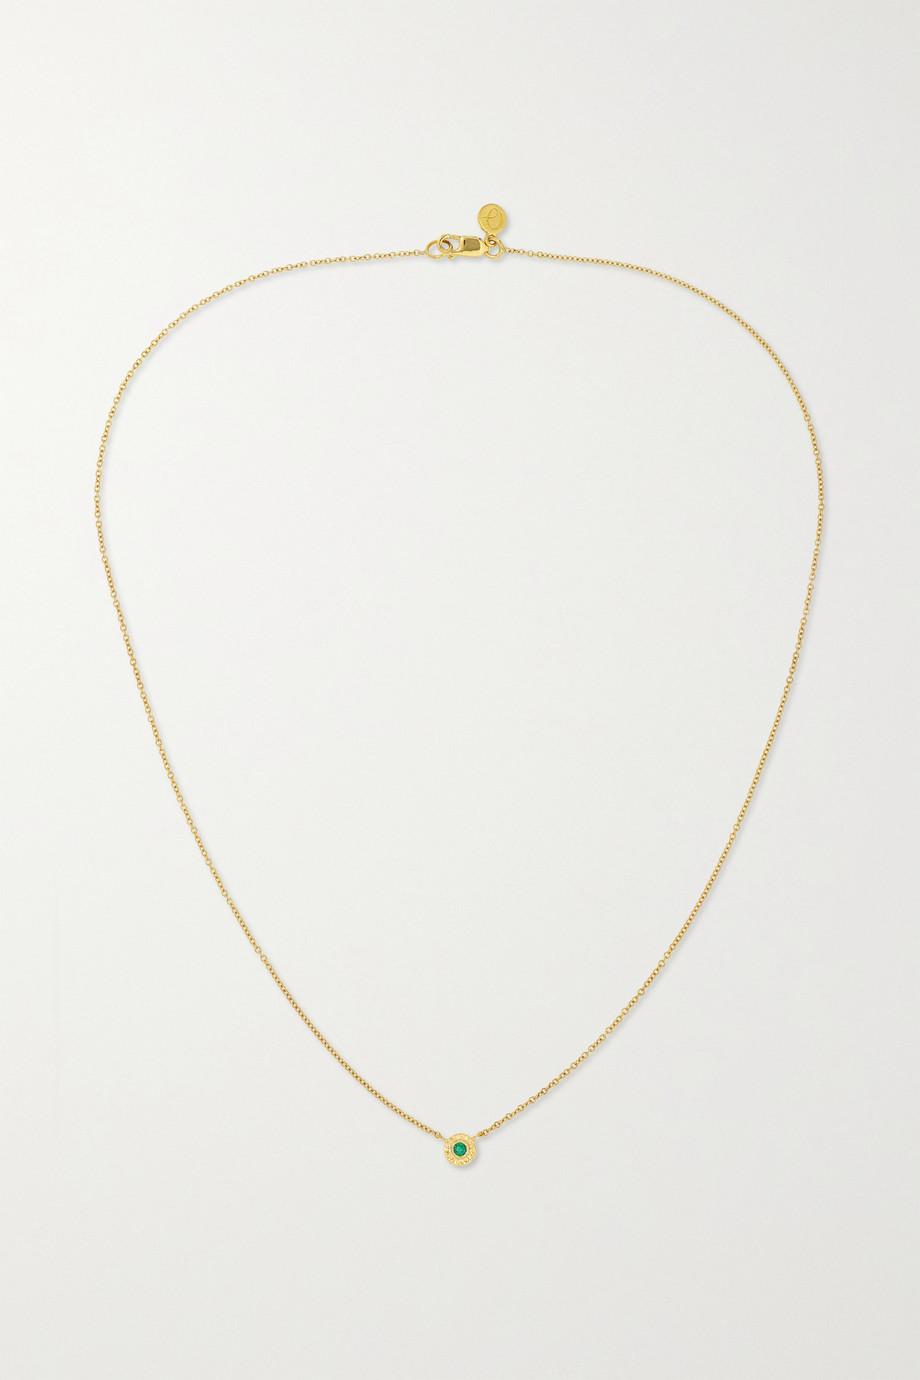 Octavia Elizabeth + NET SUSTAIN Nesting Gem 18-karat recycled gold emerald necklace